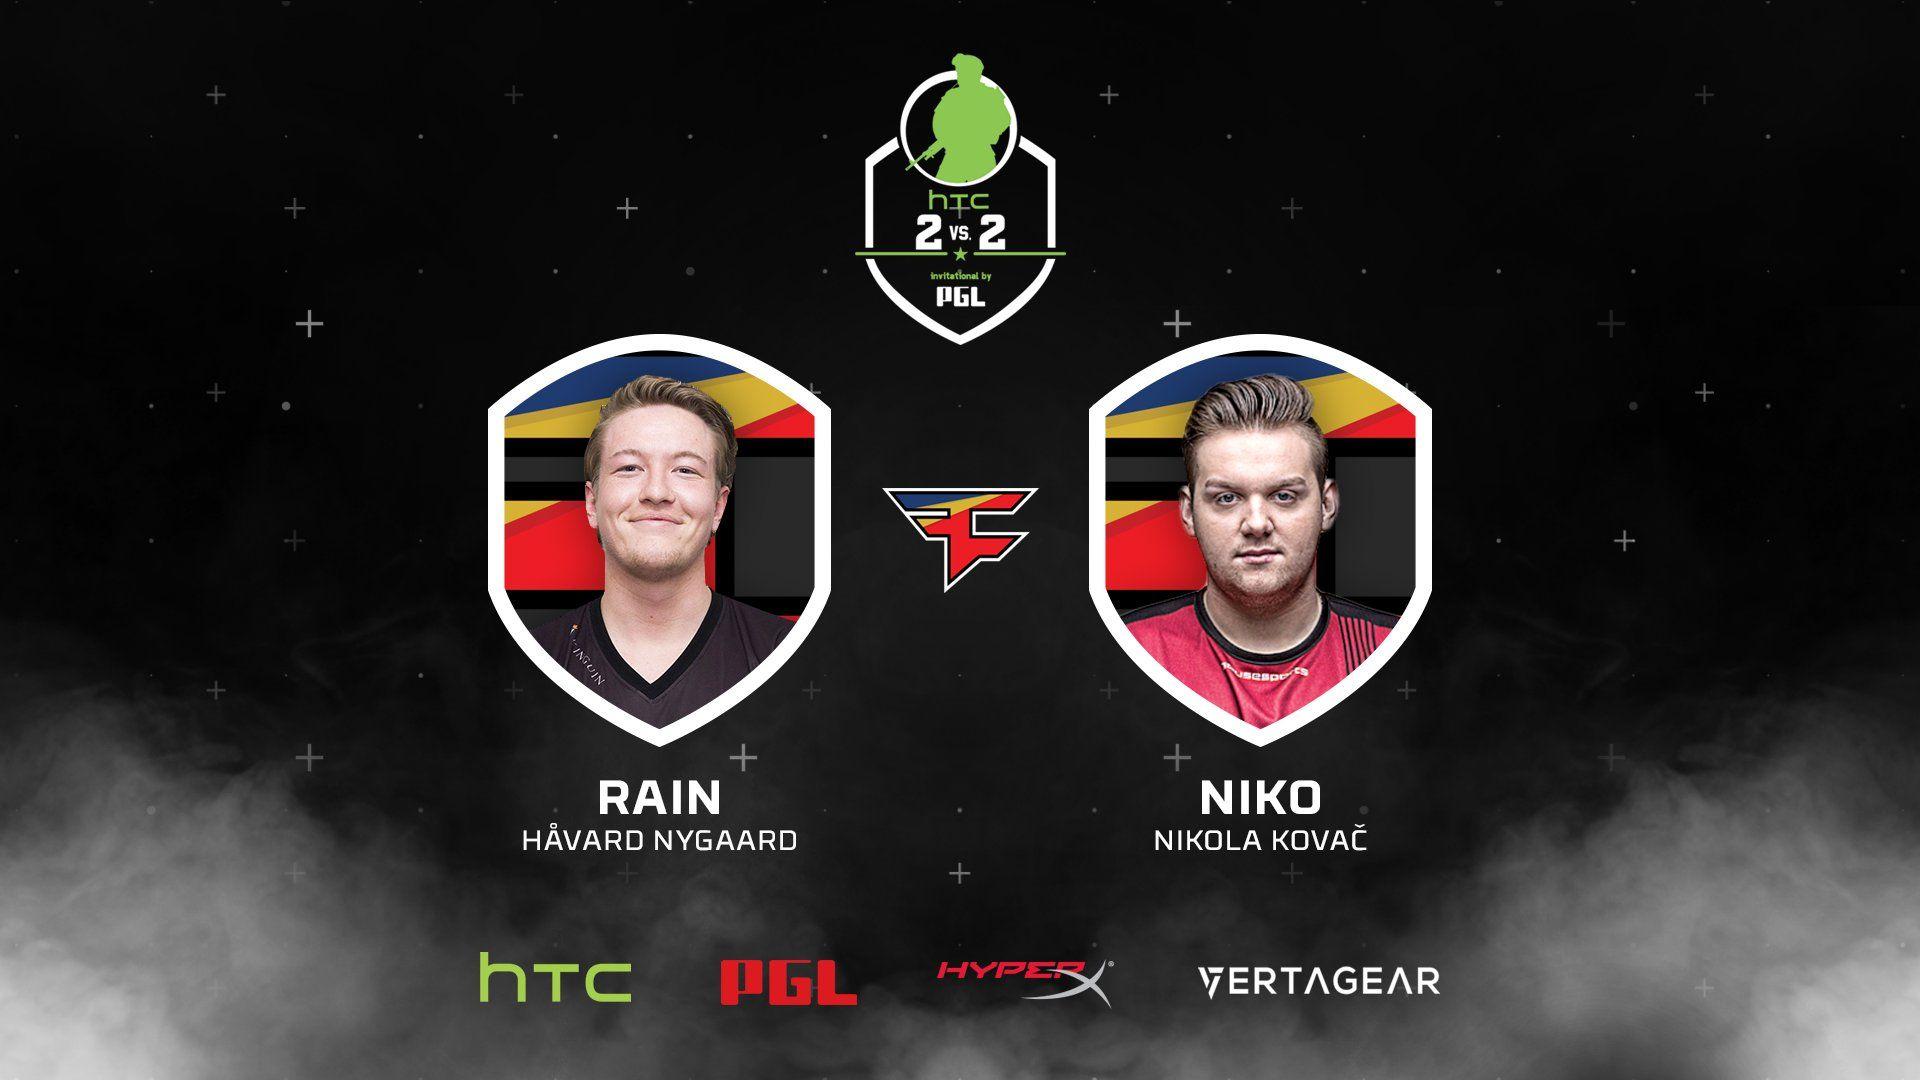 rain and NiKo to HTC 2x2 games globaloffensive CSGO 1920x1080